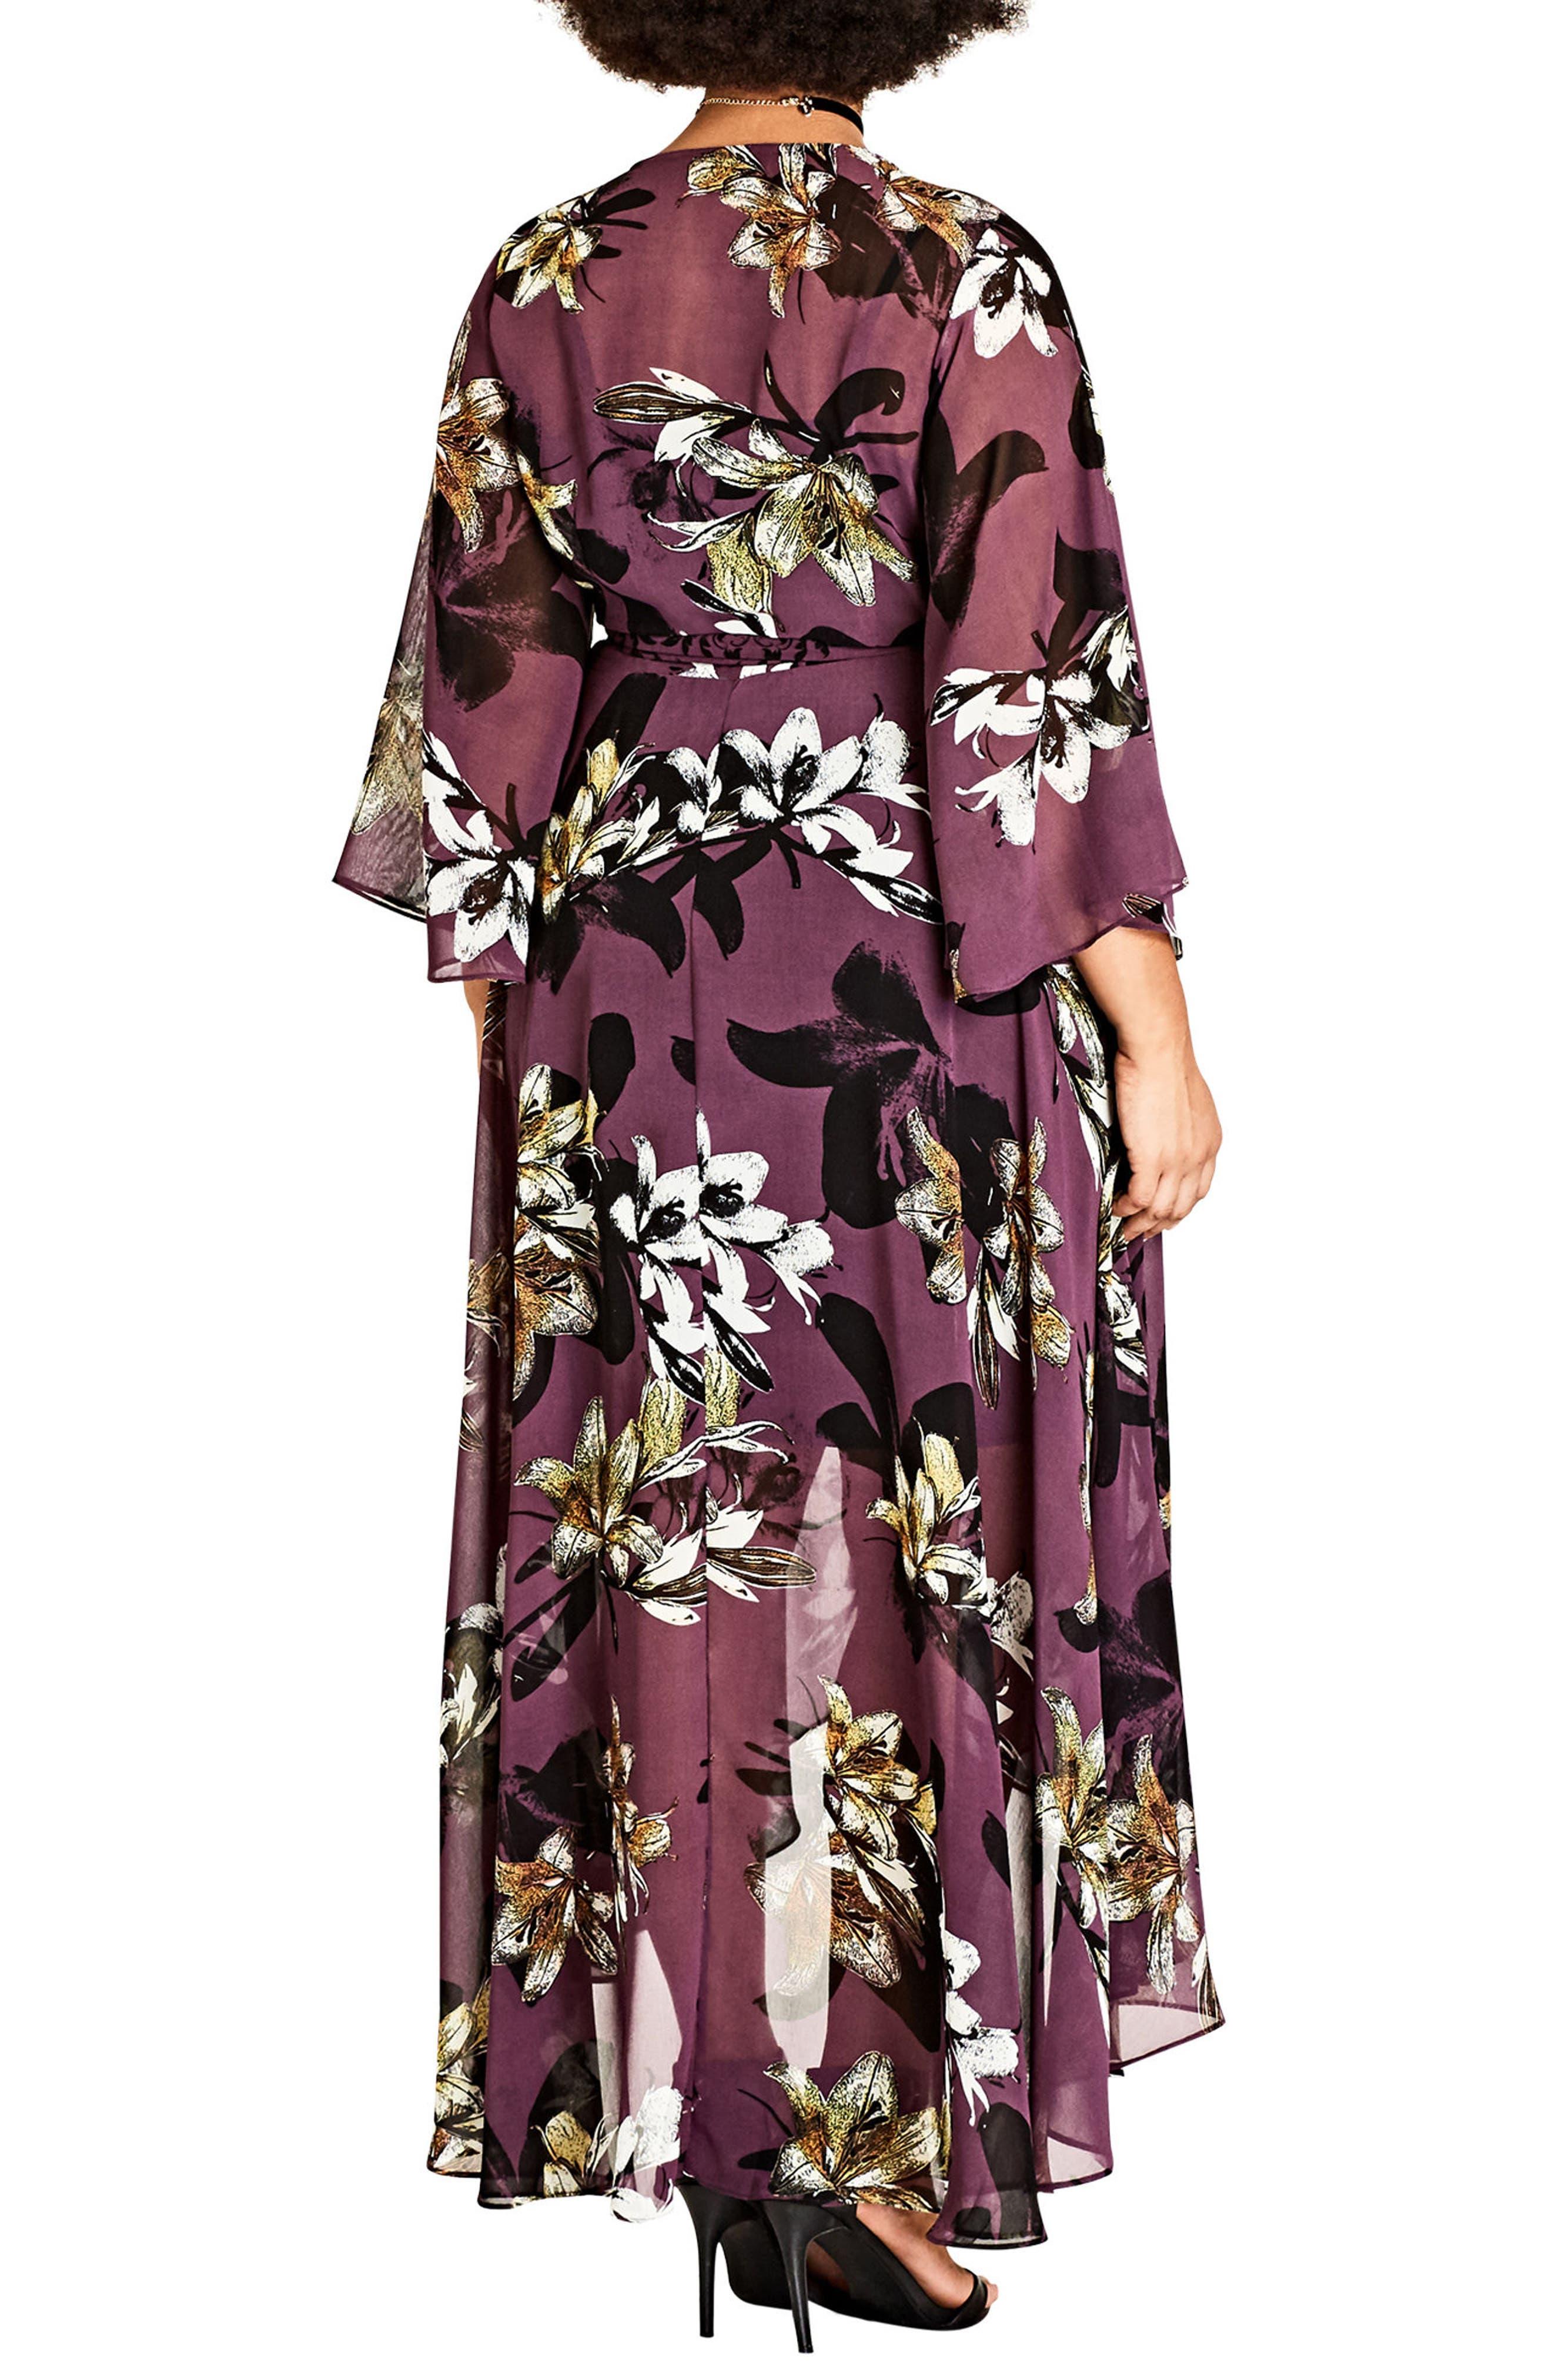 Burgundy Lily Maxi Dress,                             Alternate thumbnail 2, color,                             Burgundy Lily